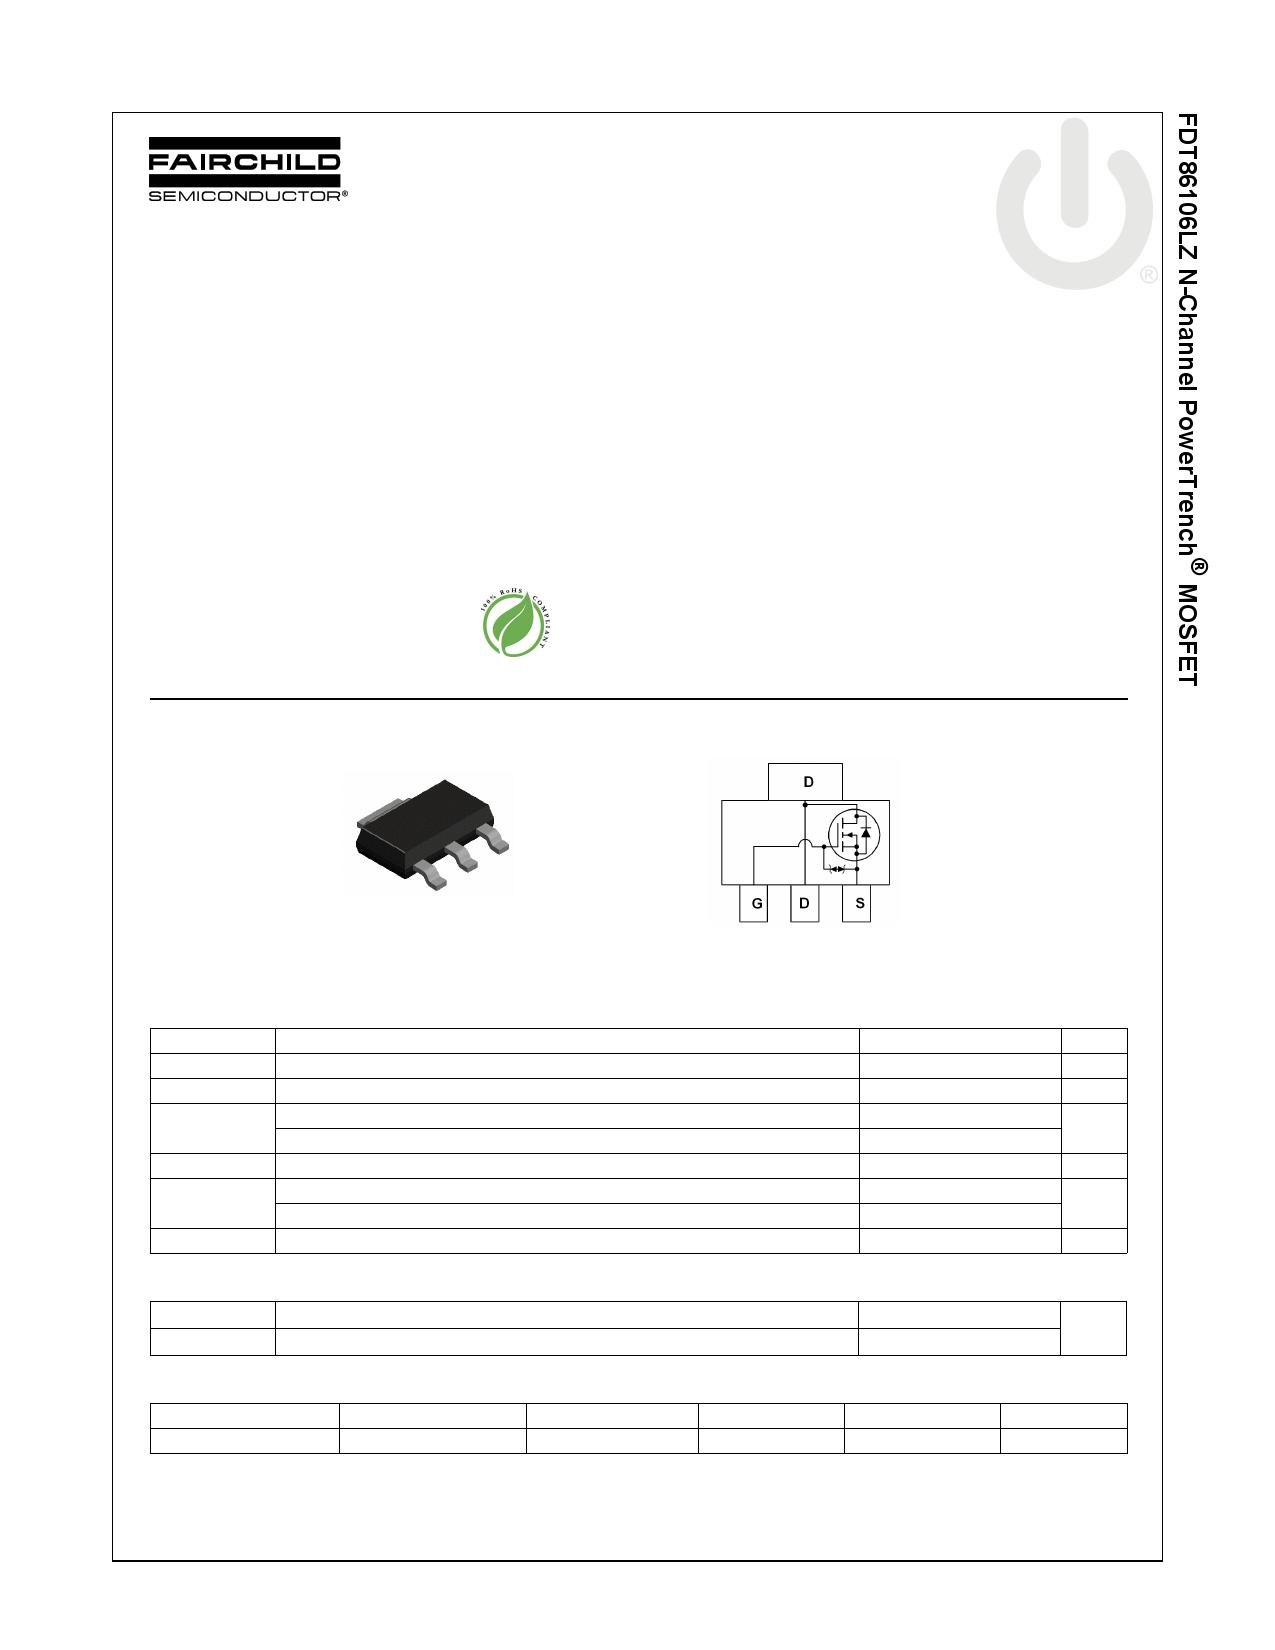 FDT86106LZ 데이터시트 및 FDT86106LZ PDF